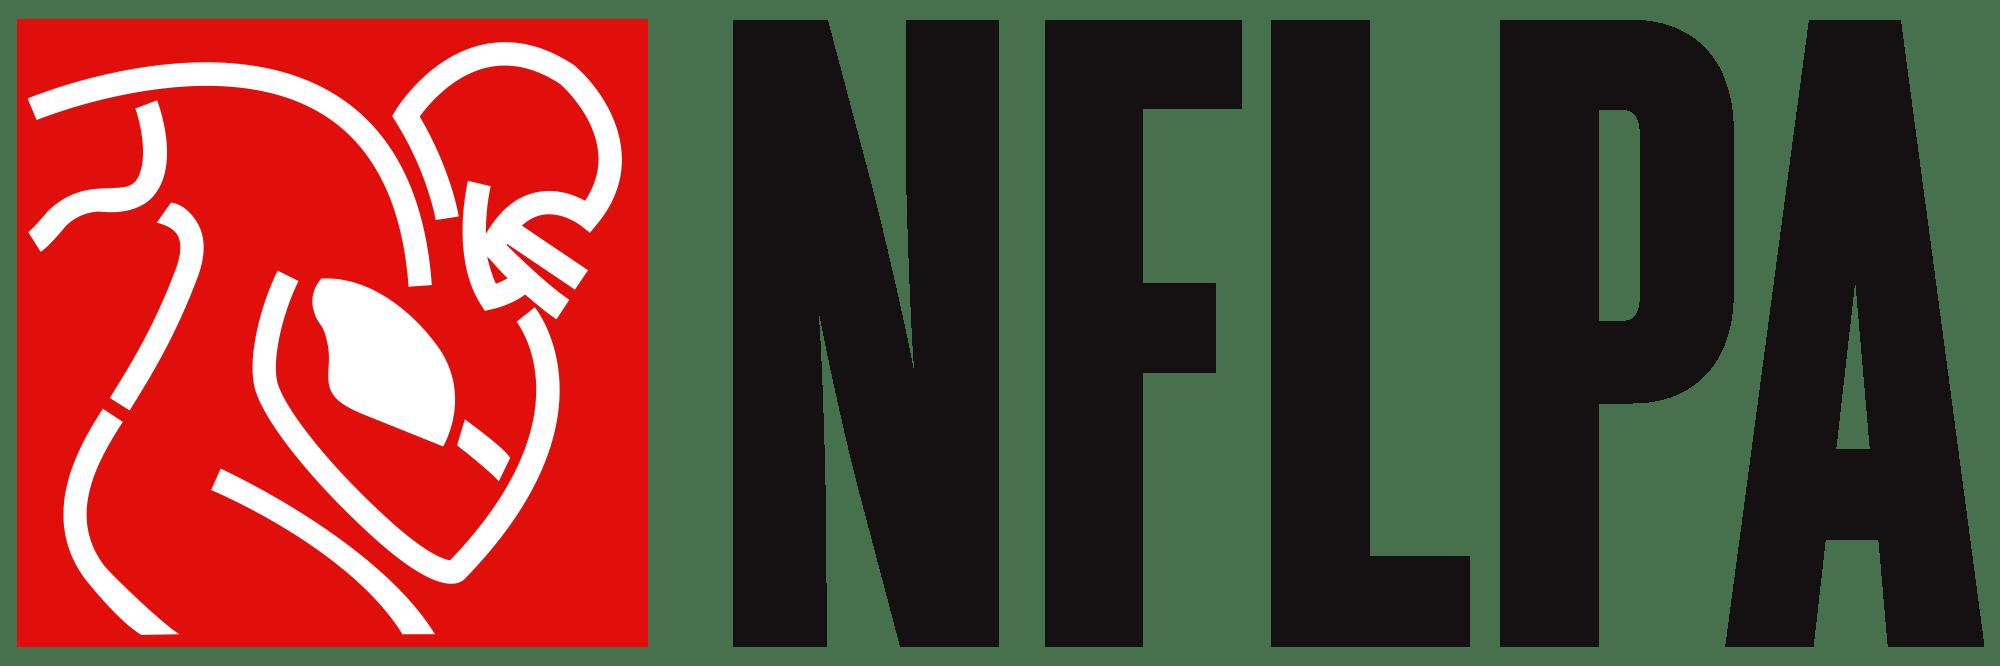 NFL Players Association (NFLPA) logo